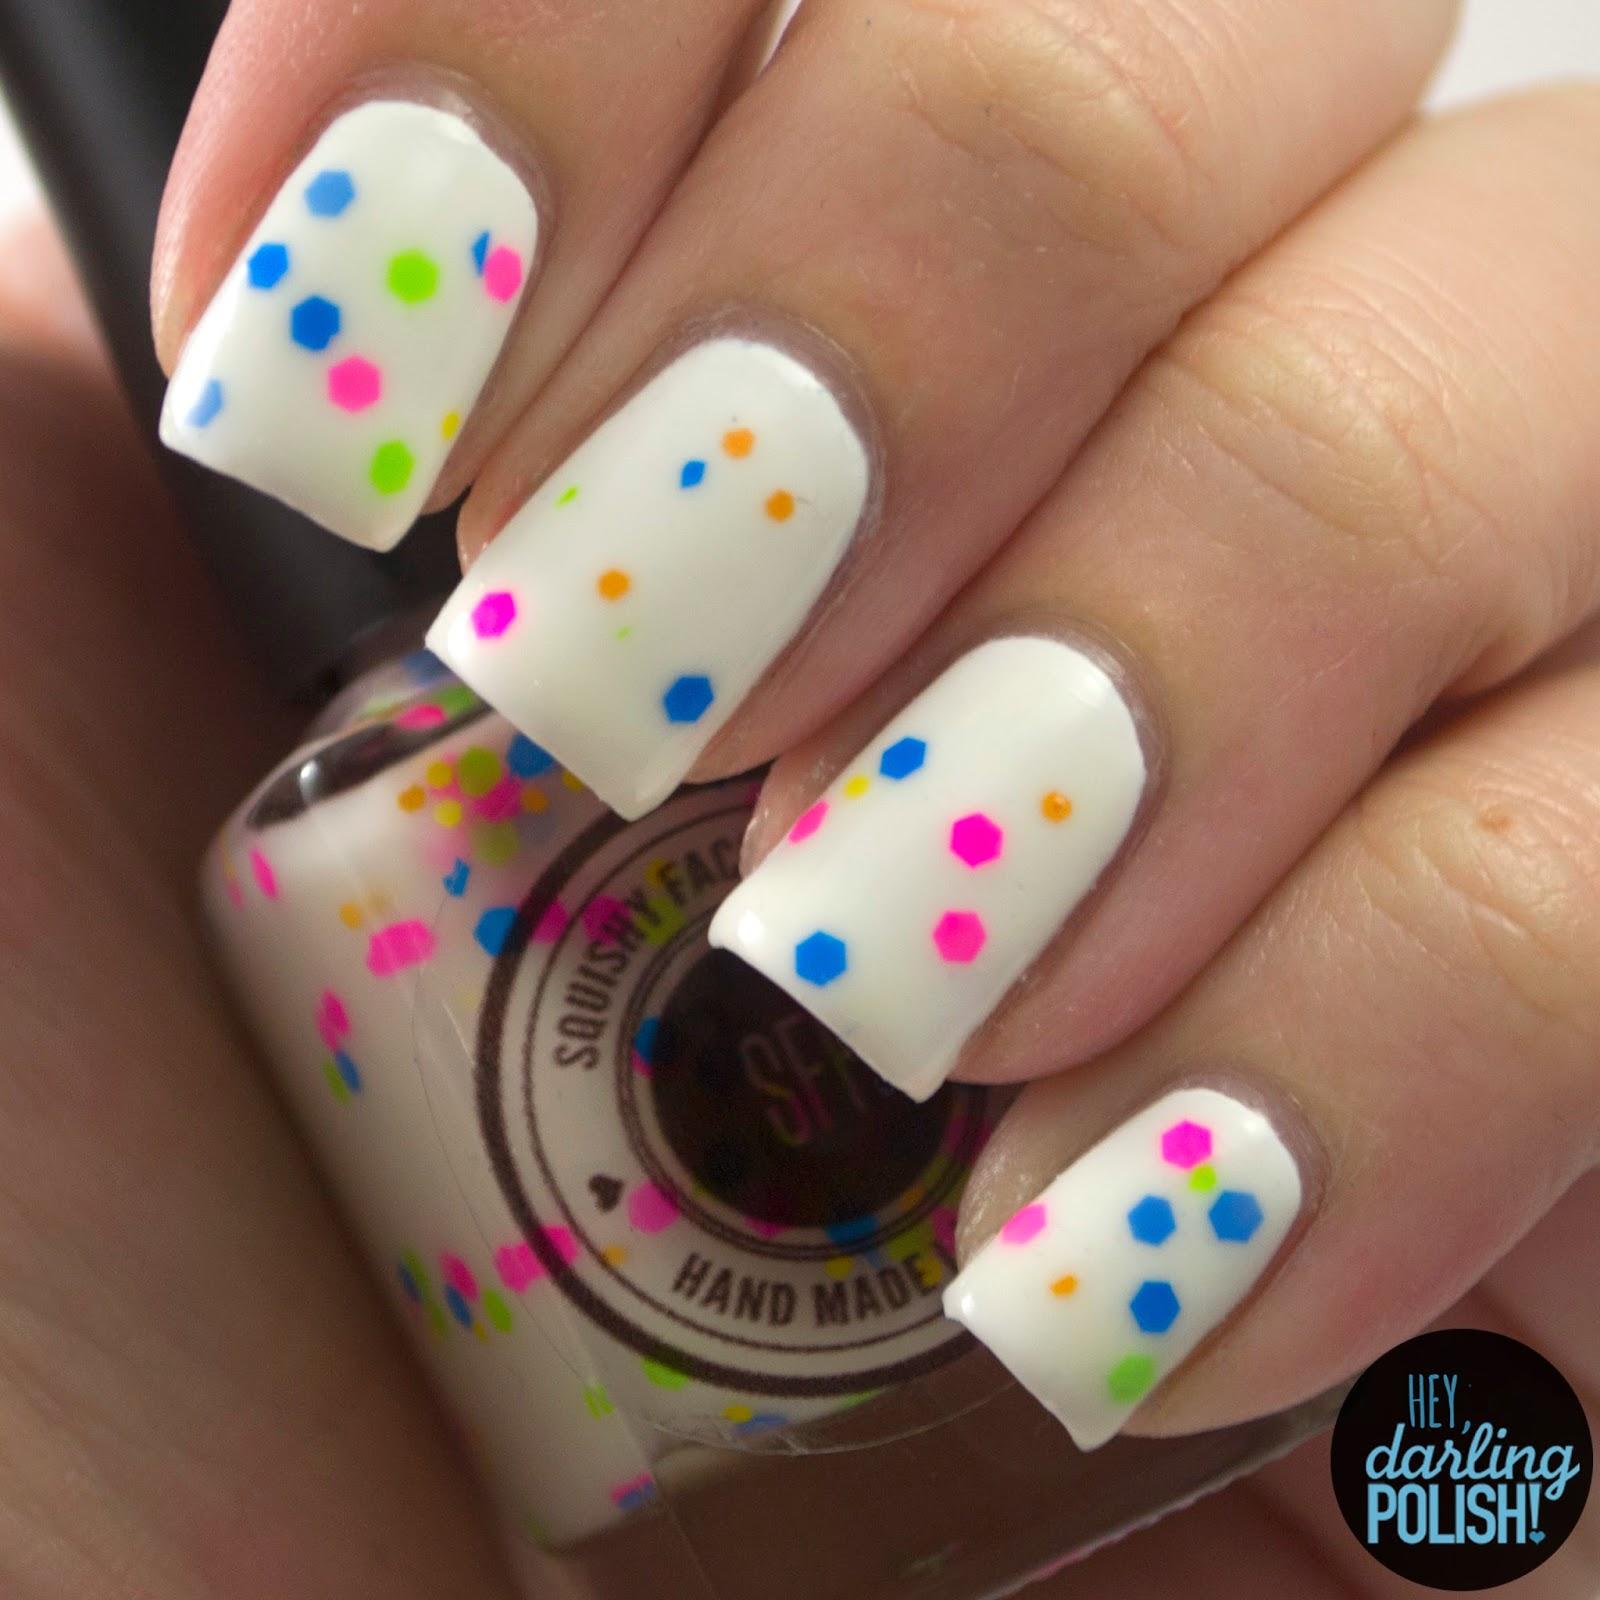 true colors, white, green, blue, pink, purple, neon, glitter, nails, nail polish, polish, indie, indie nail polish, indie polish, hey darling polish, squishy face polish